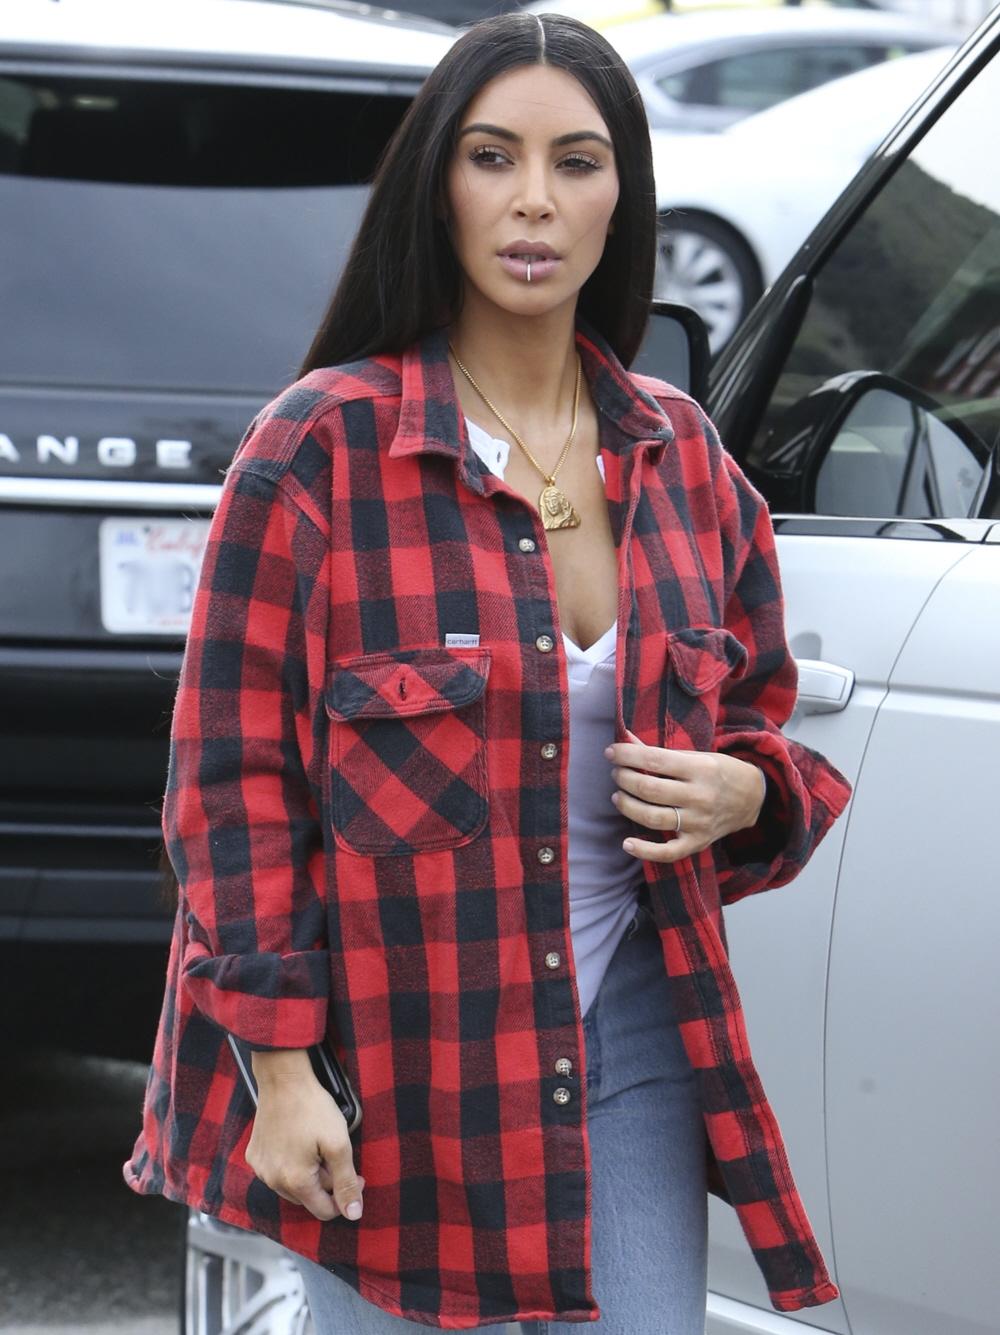 FFN_FF9_FF10_Kardashian_West_011817_52285973  bitchy | What ought to we consider Kim Kardashian's 'excessive vogue grunge' ensemble? FFN FF9 FF10 Kardashian West 011817 52285973